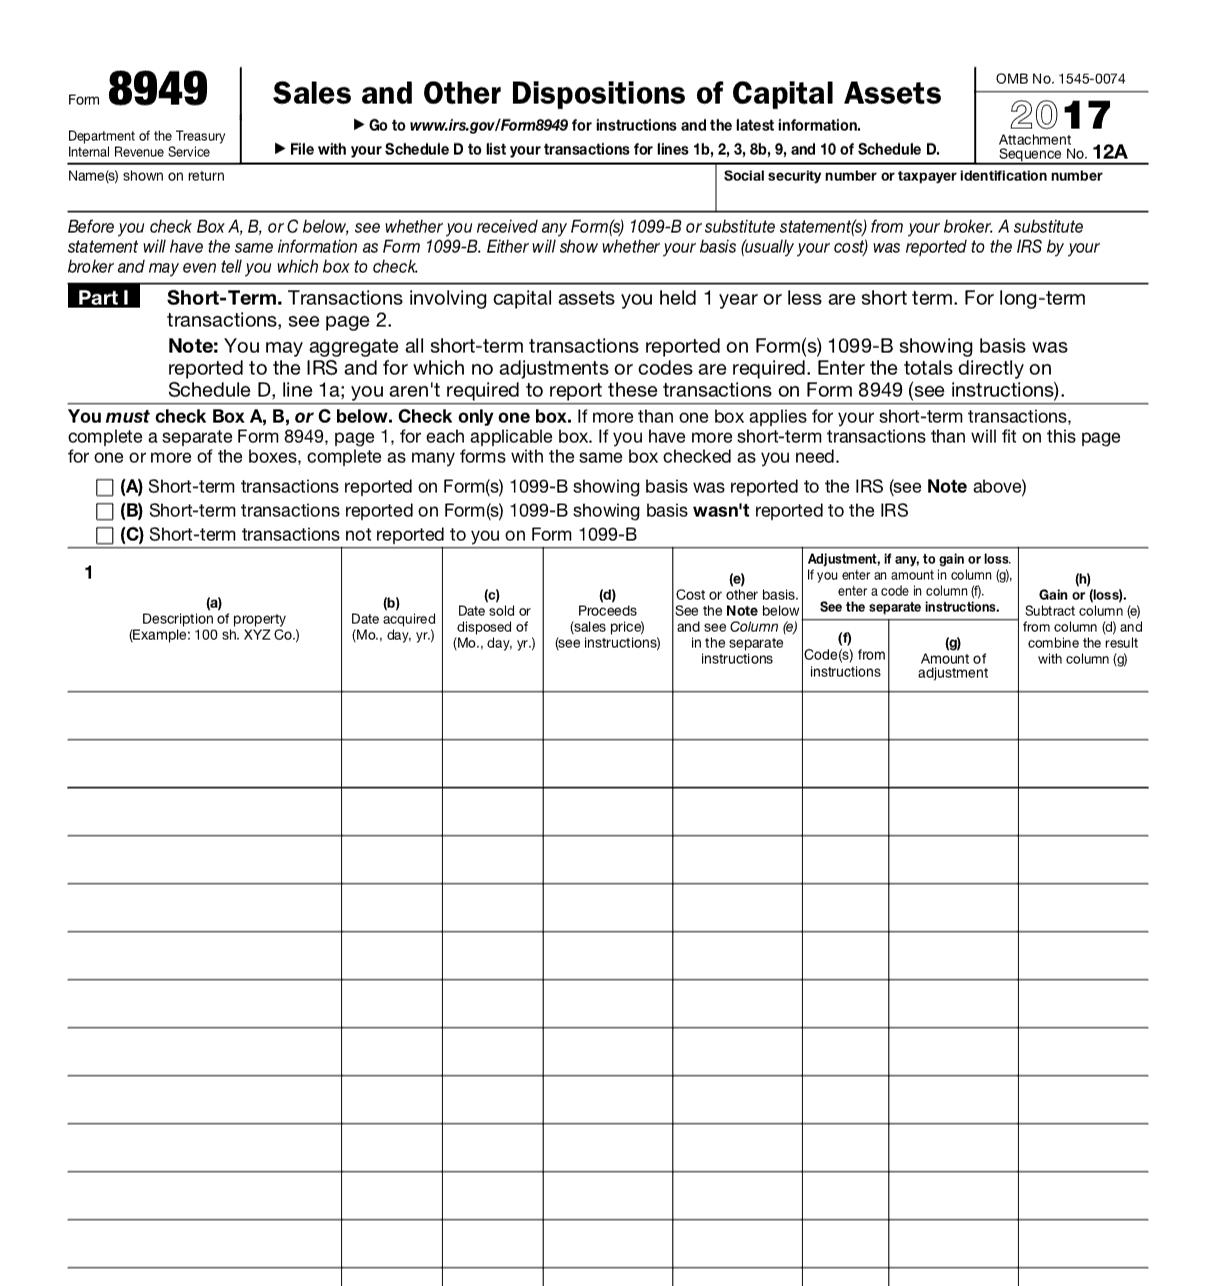 form 8949 2017 - Heart.impulsar.co